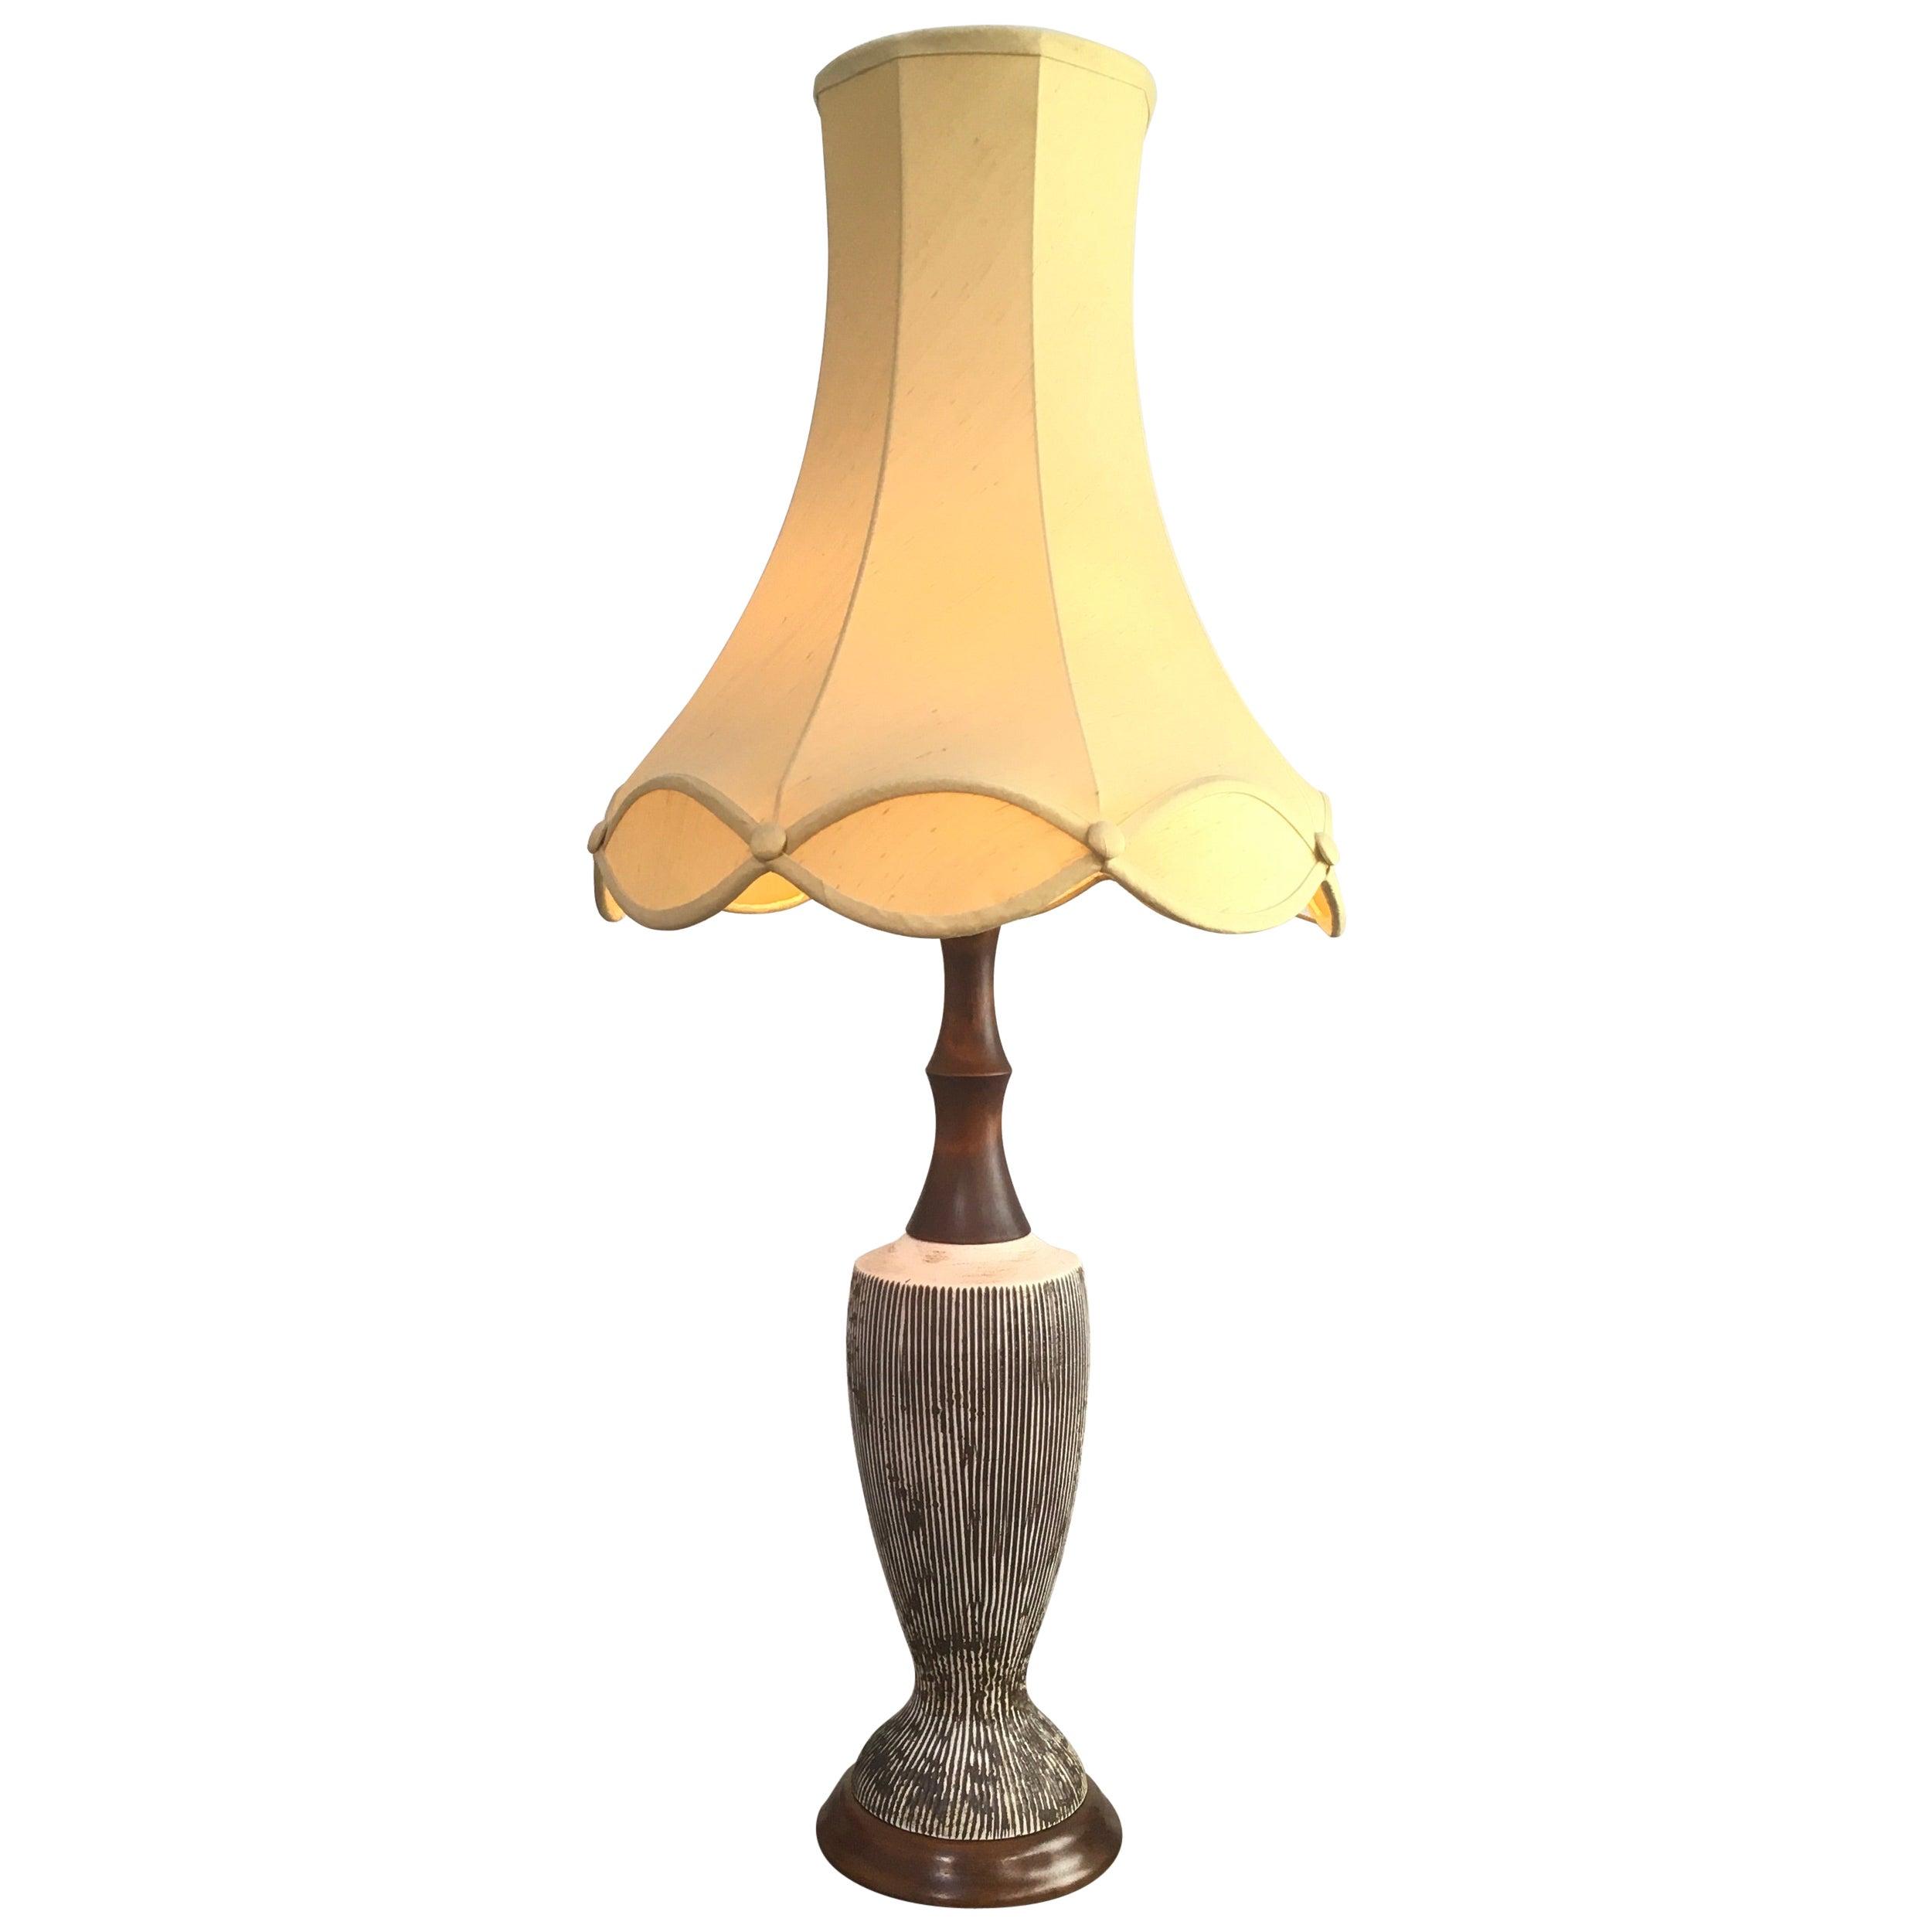 Ellis Pottery Sgraffito Ceramic and 'Walnut' Table Lamp Base Melbourne, 1950s